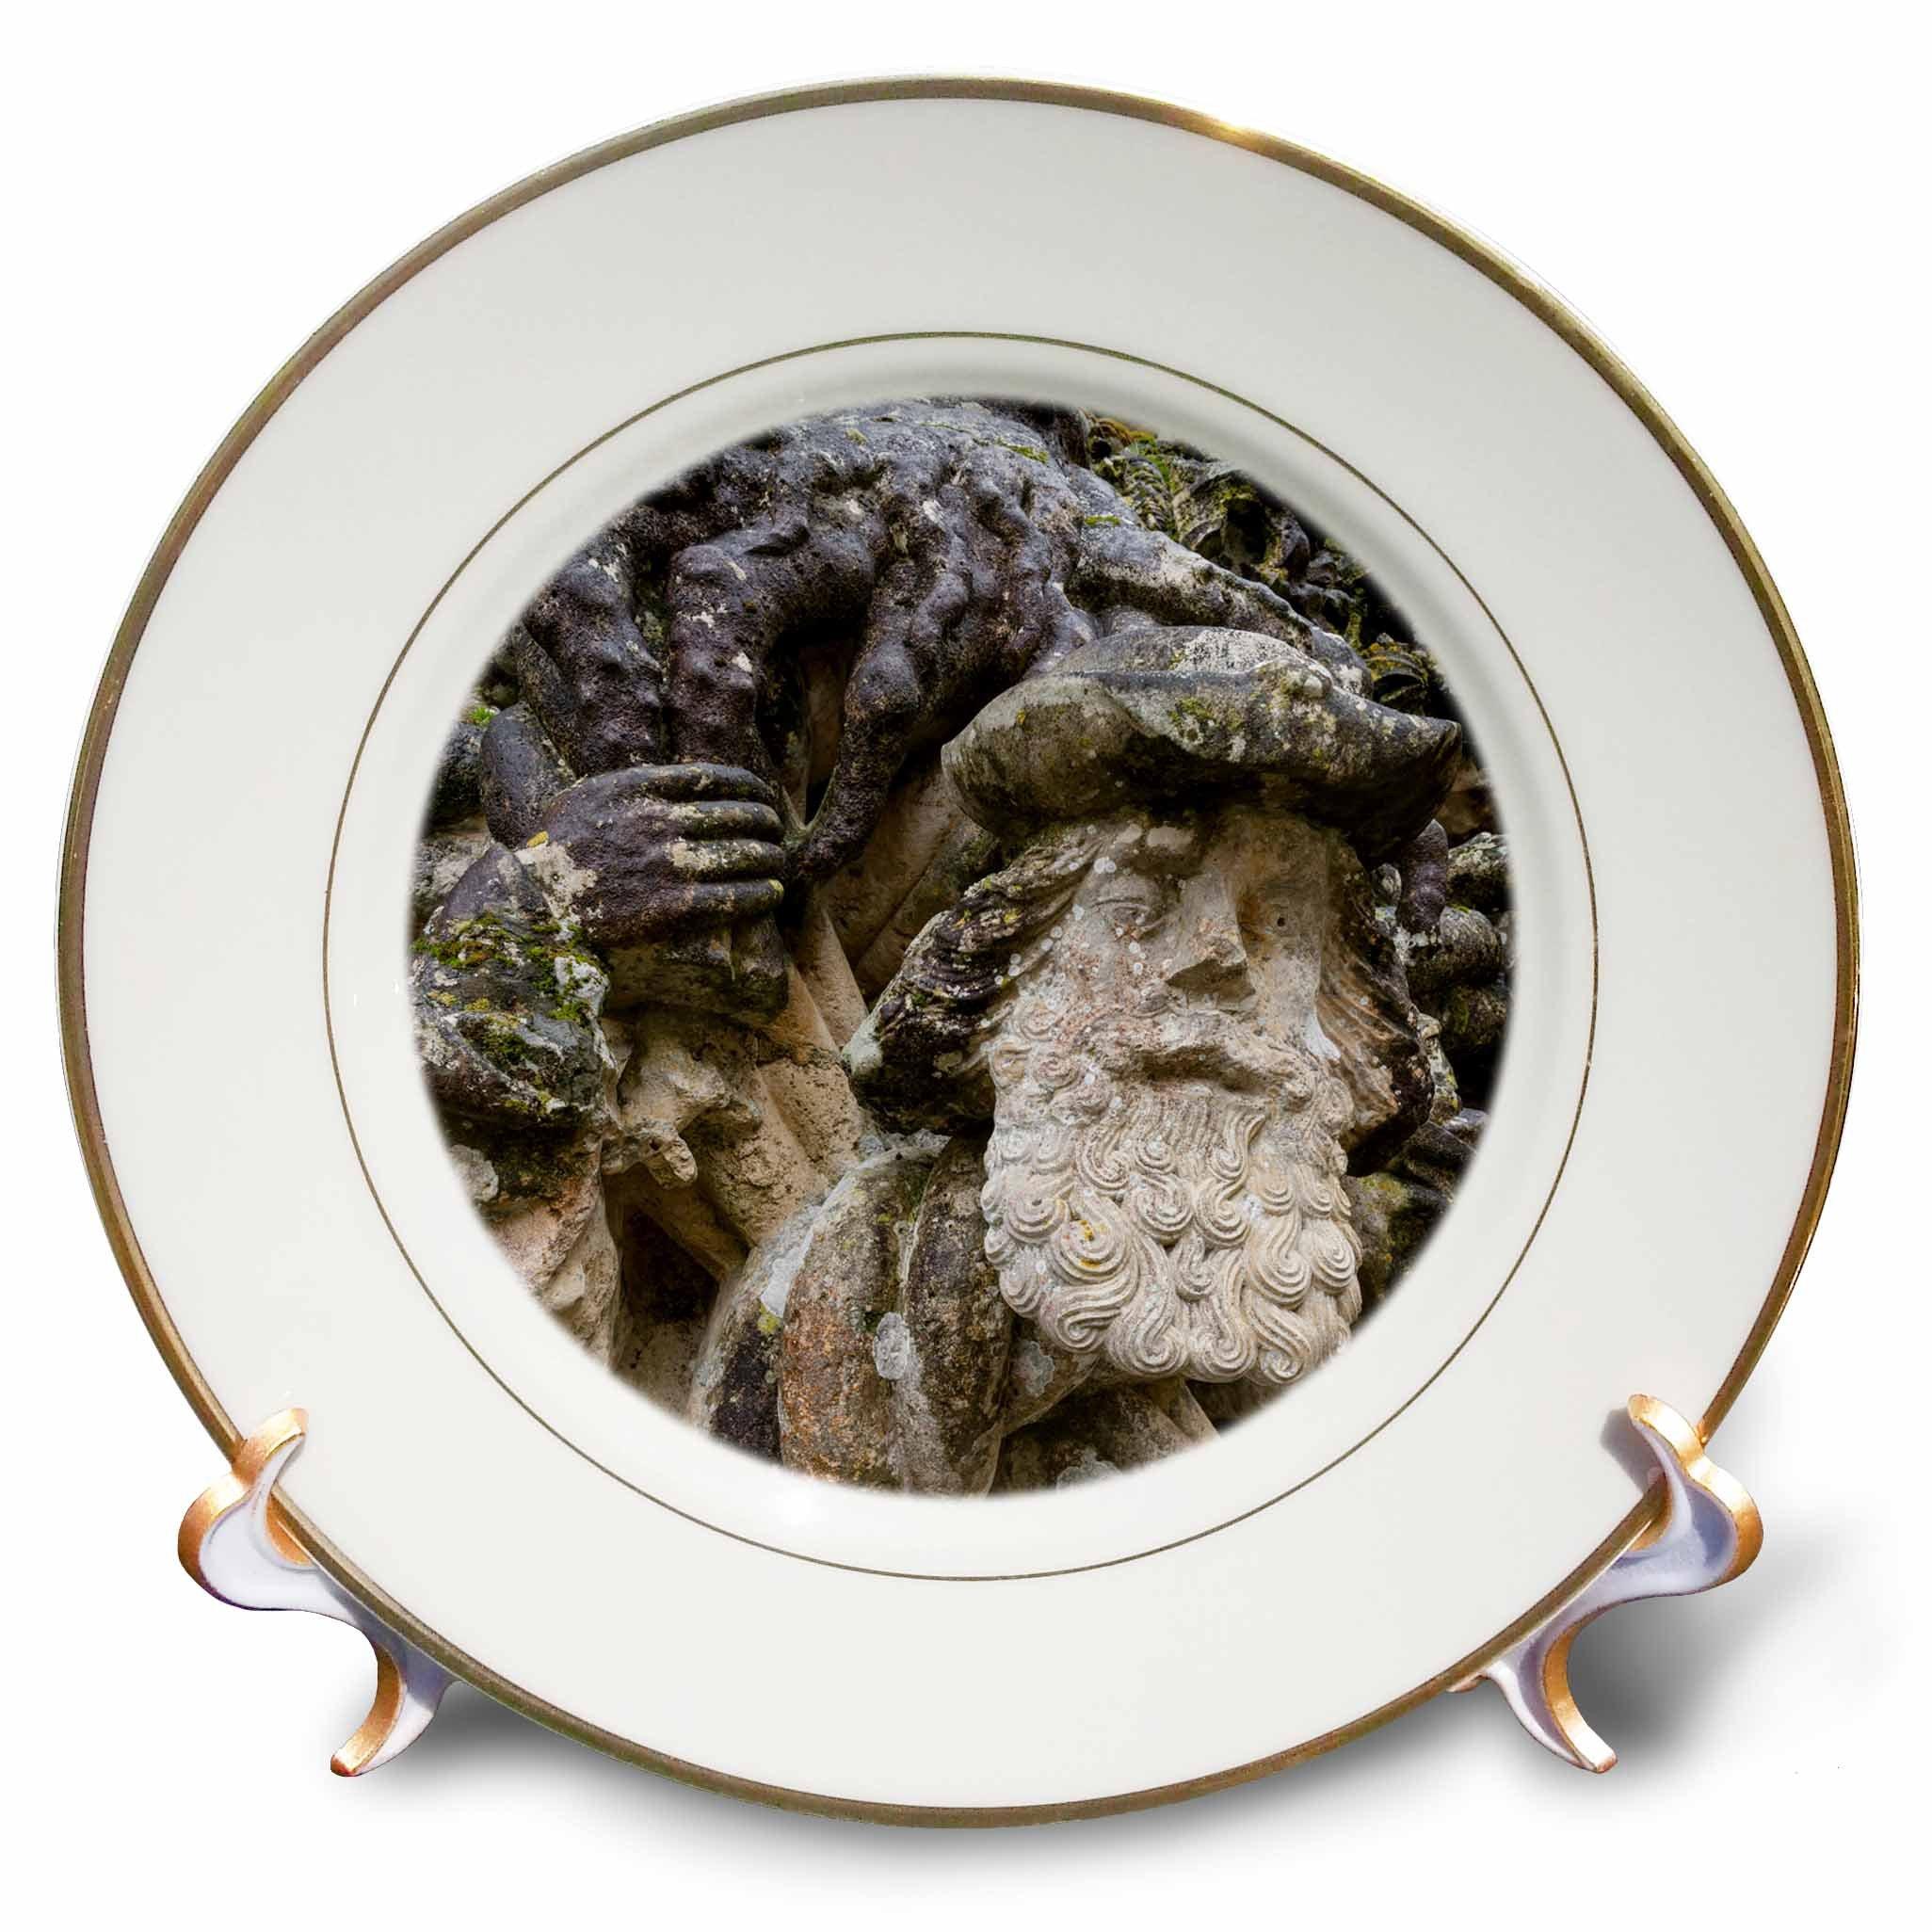 3dRose Danita Delimont - Religion - Face sculpture, Manueline Window, Convent of Christ, Tomar, Portugal - 8 inch Porcelain Plate (cp_277808_1)